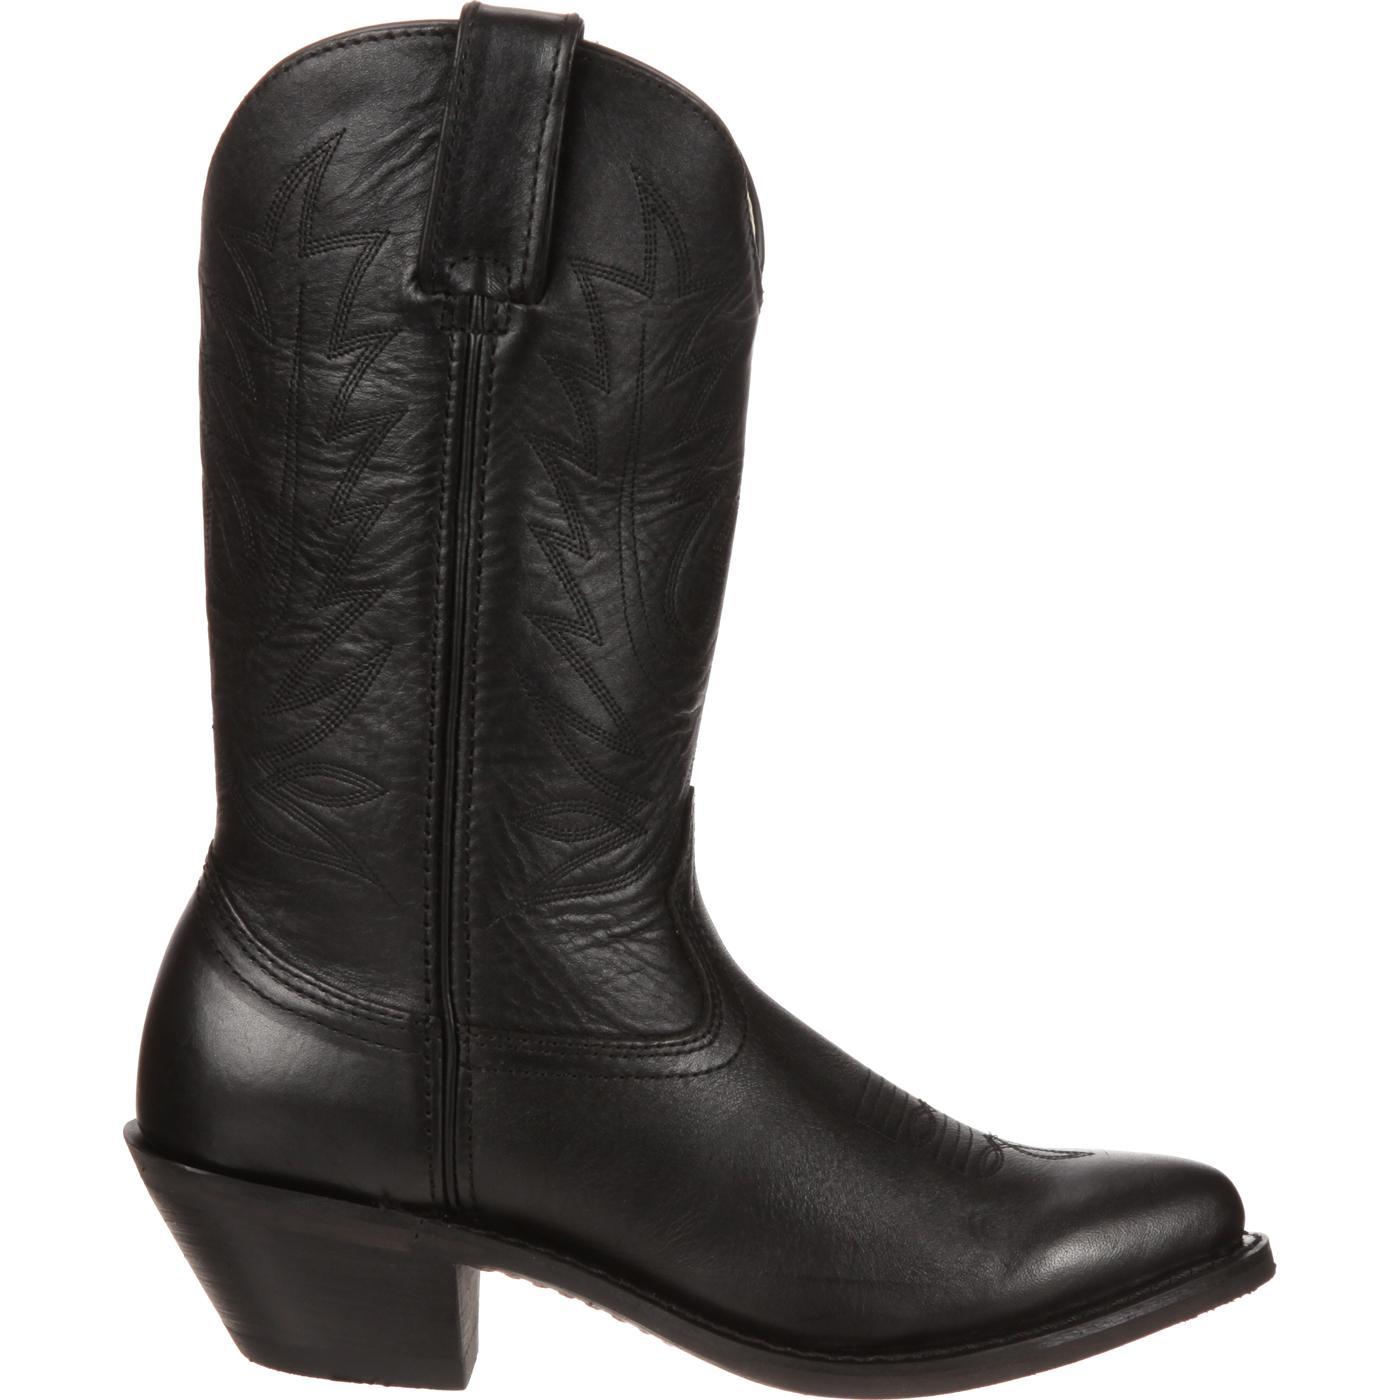 6740dd8155d Durango Women's Black Leather Western Boot